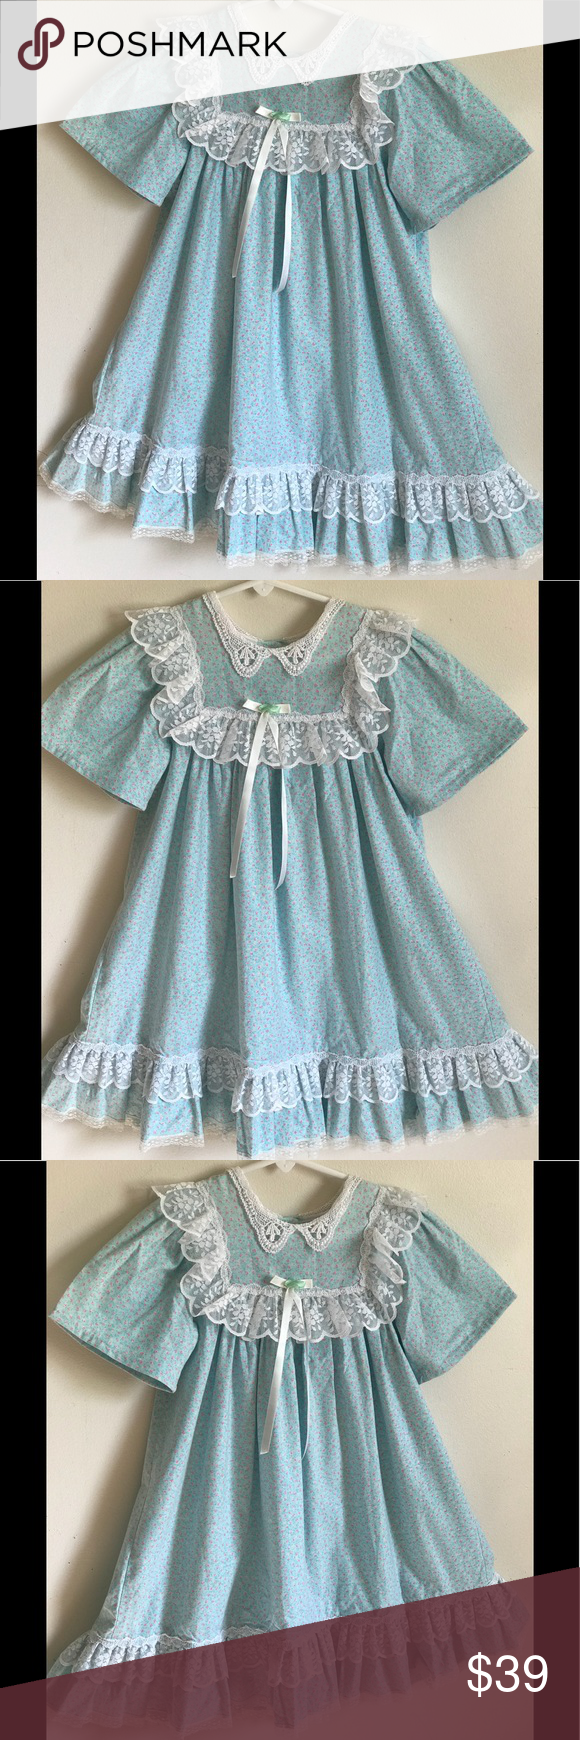 Rare us bryan swiss custom lace toddler dress my posh closet